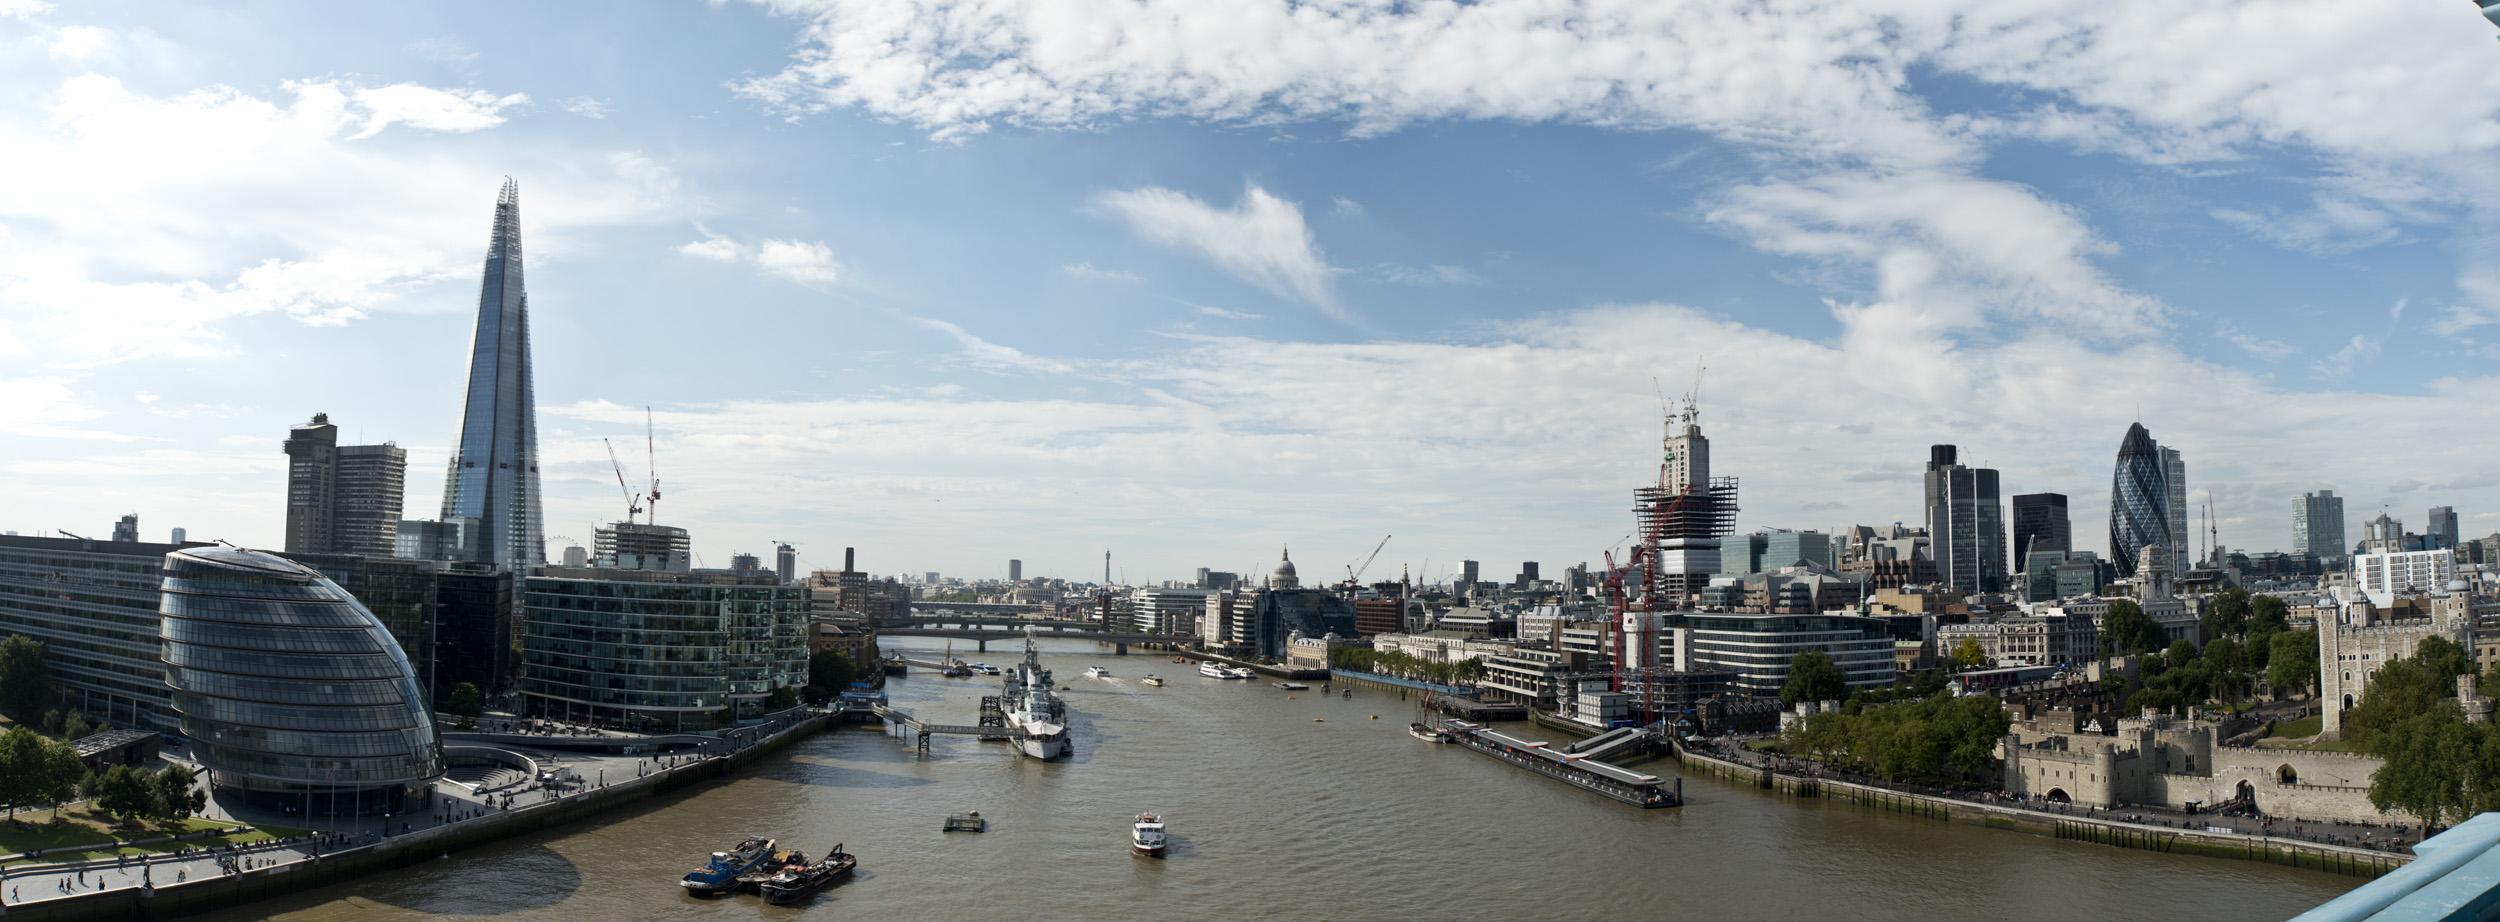 london - photo #28